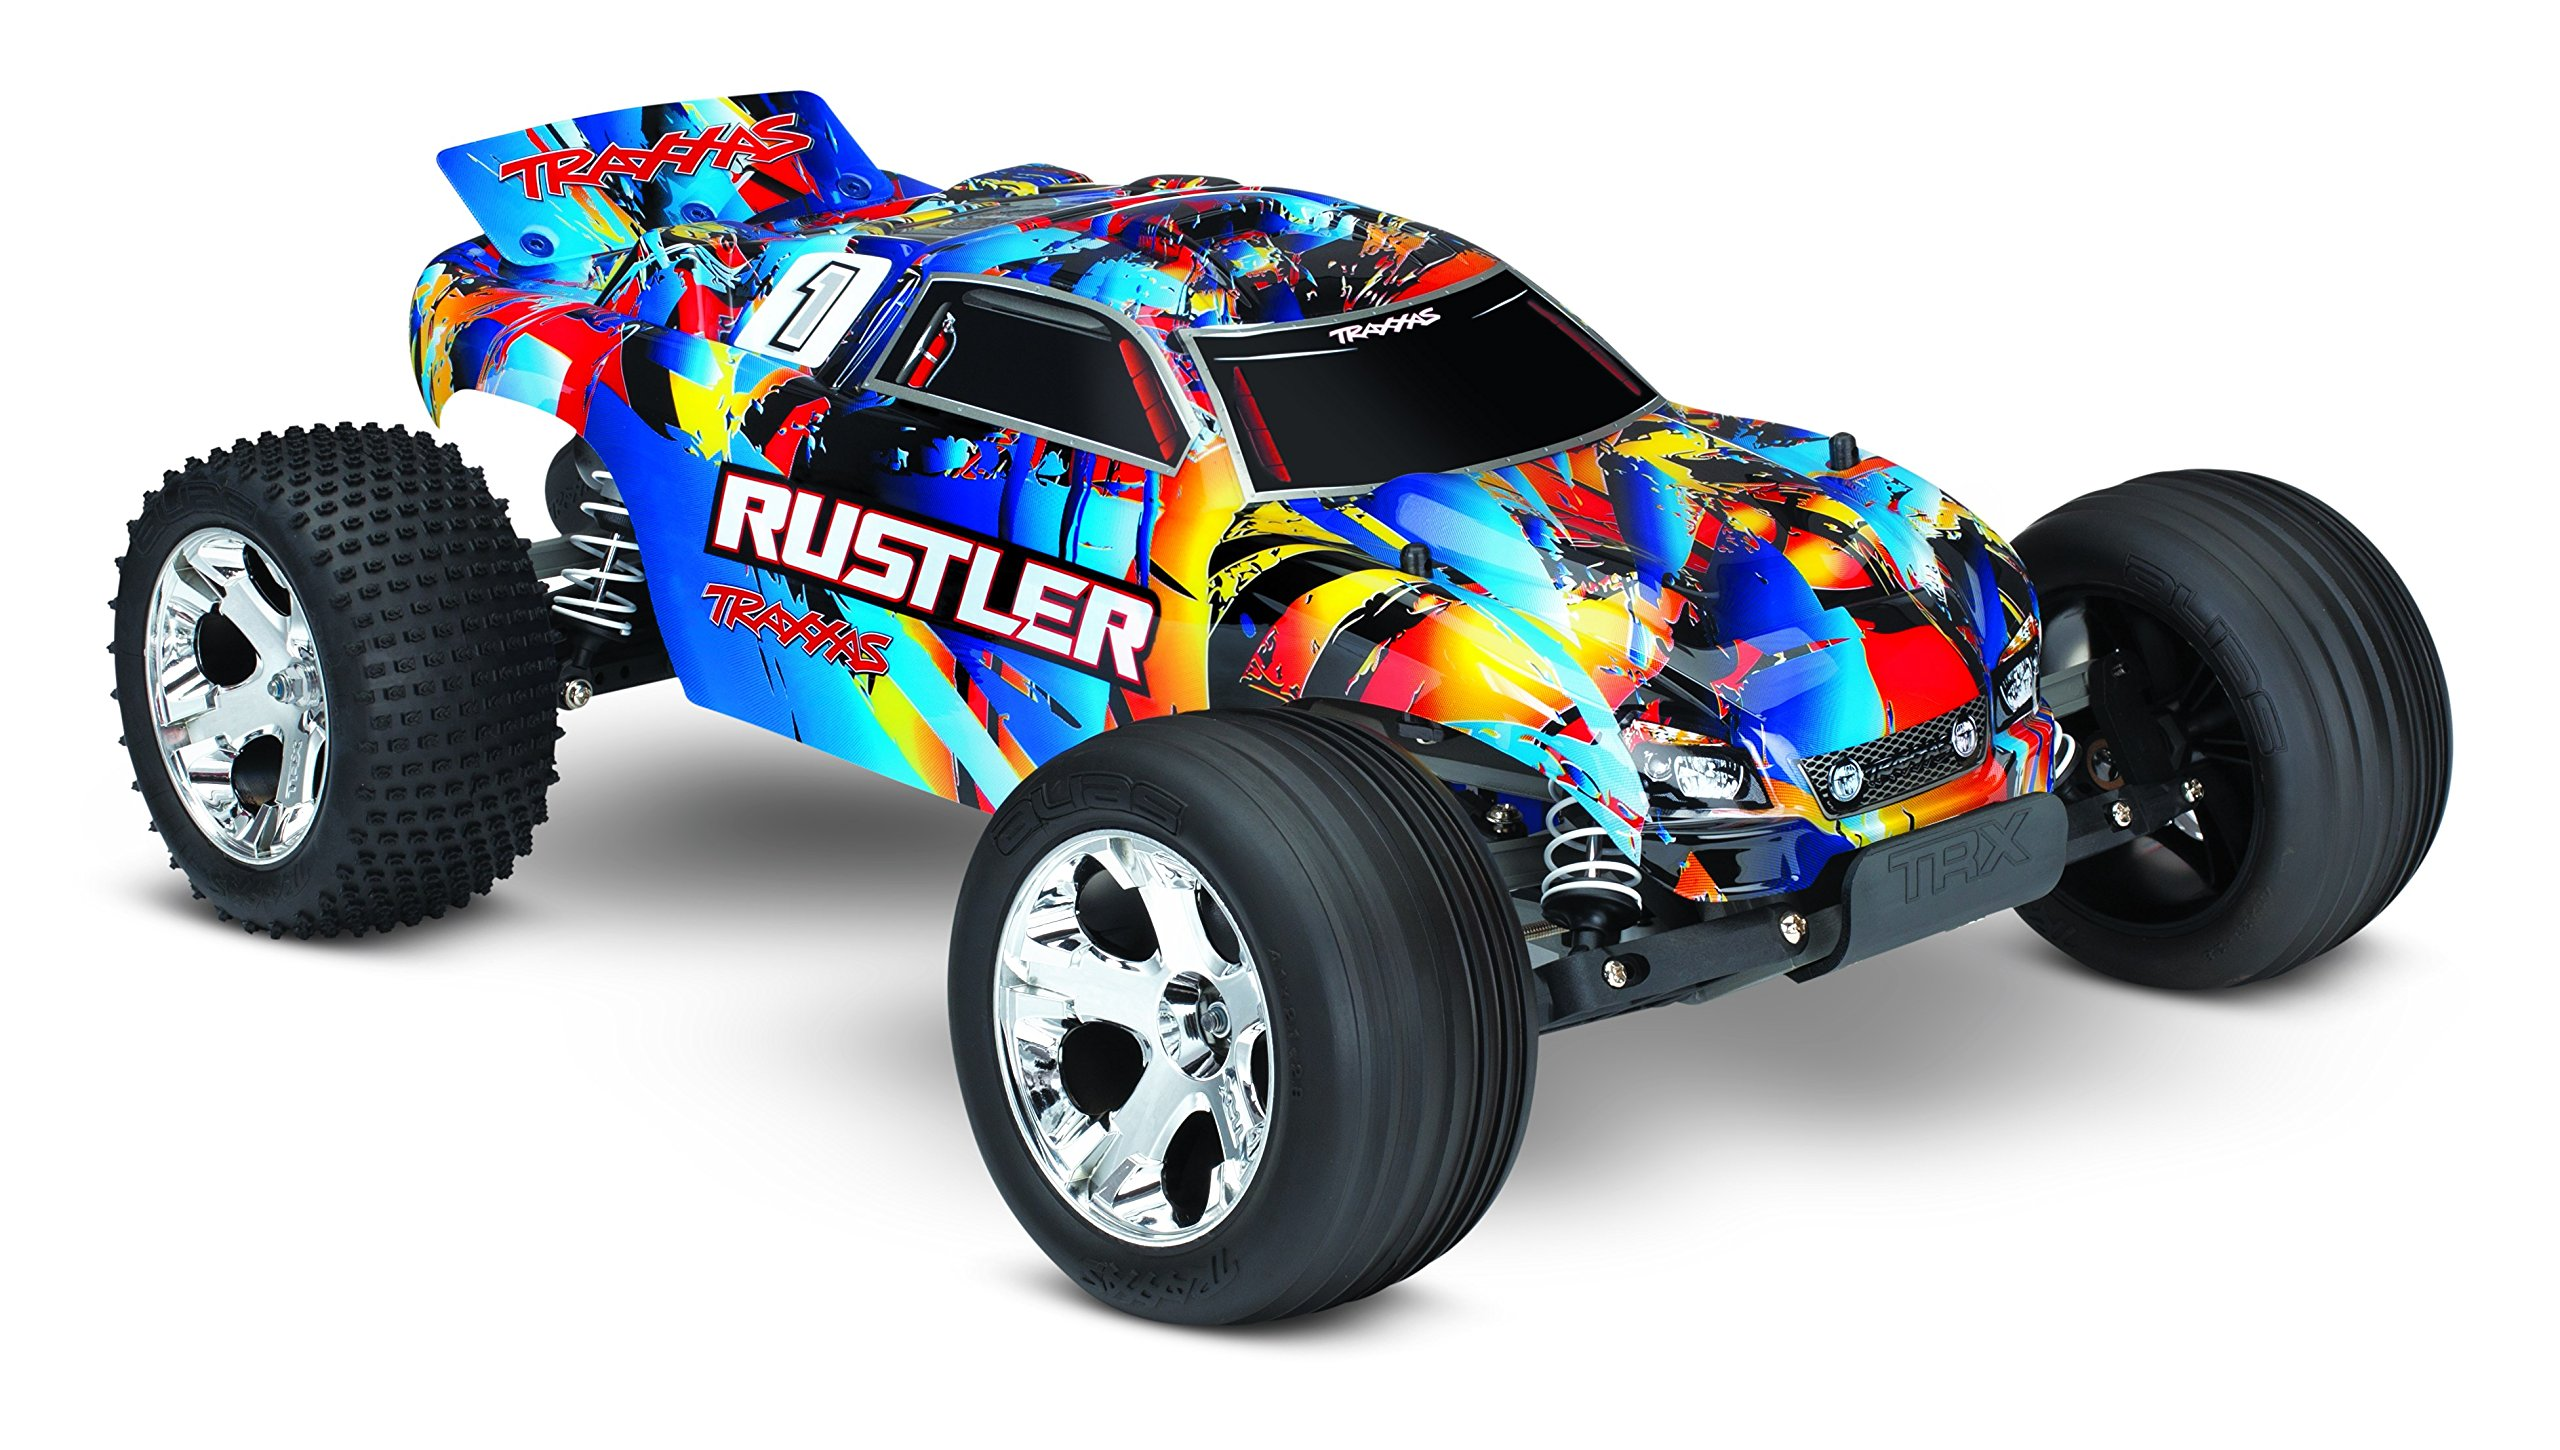 Traxxas 370544 Rustler: 1/10 Scale 2WD Stadium Truck with TQ 2.4ghz Radio System Road, Rock n' Roll